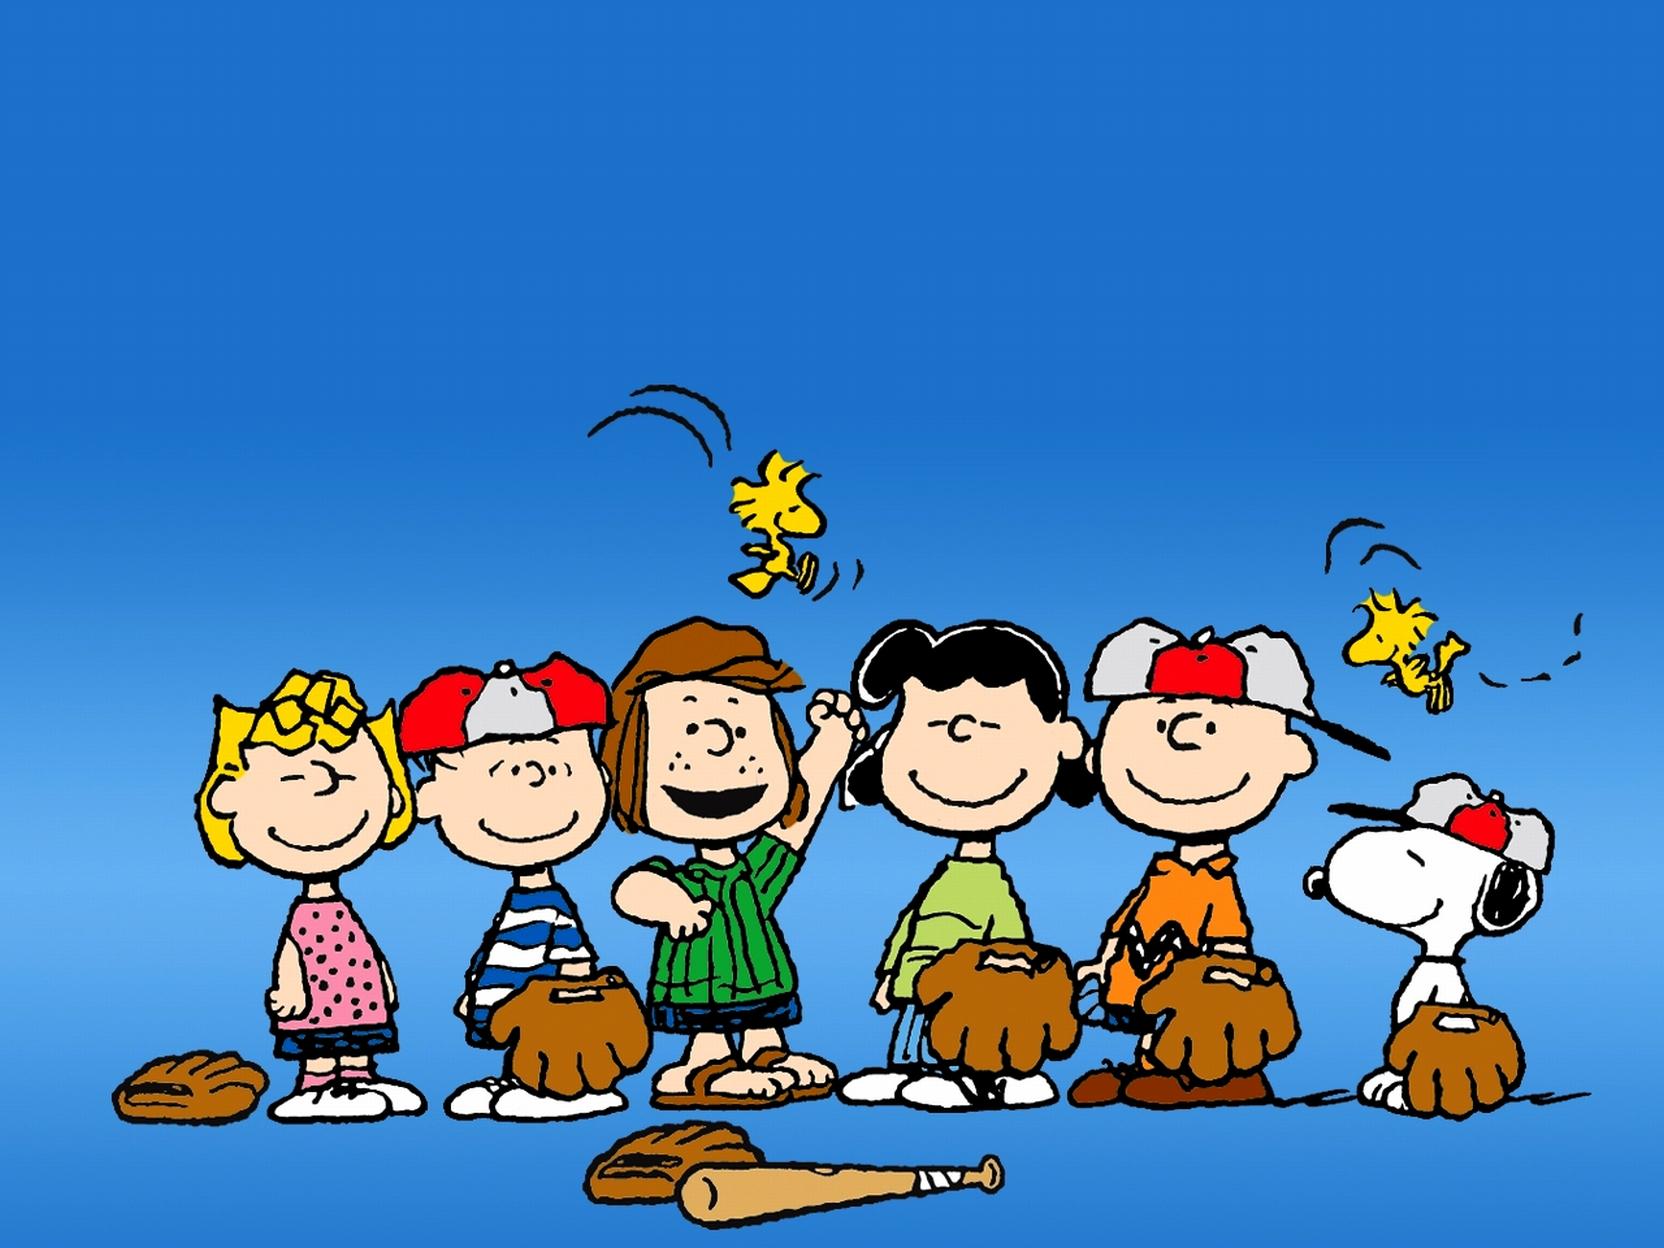 50 Free Charlie Brown Valentine Wallpaper On Wallpapersafari